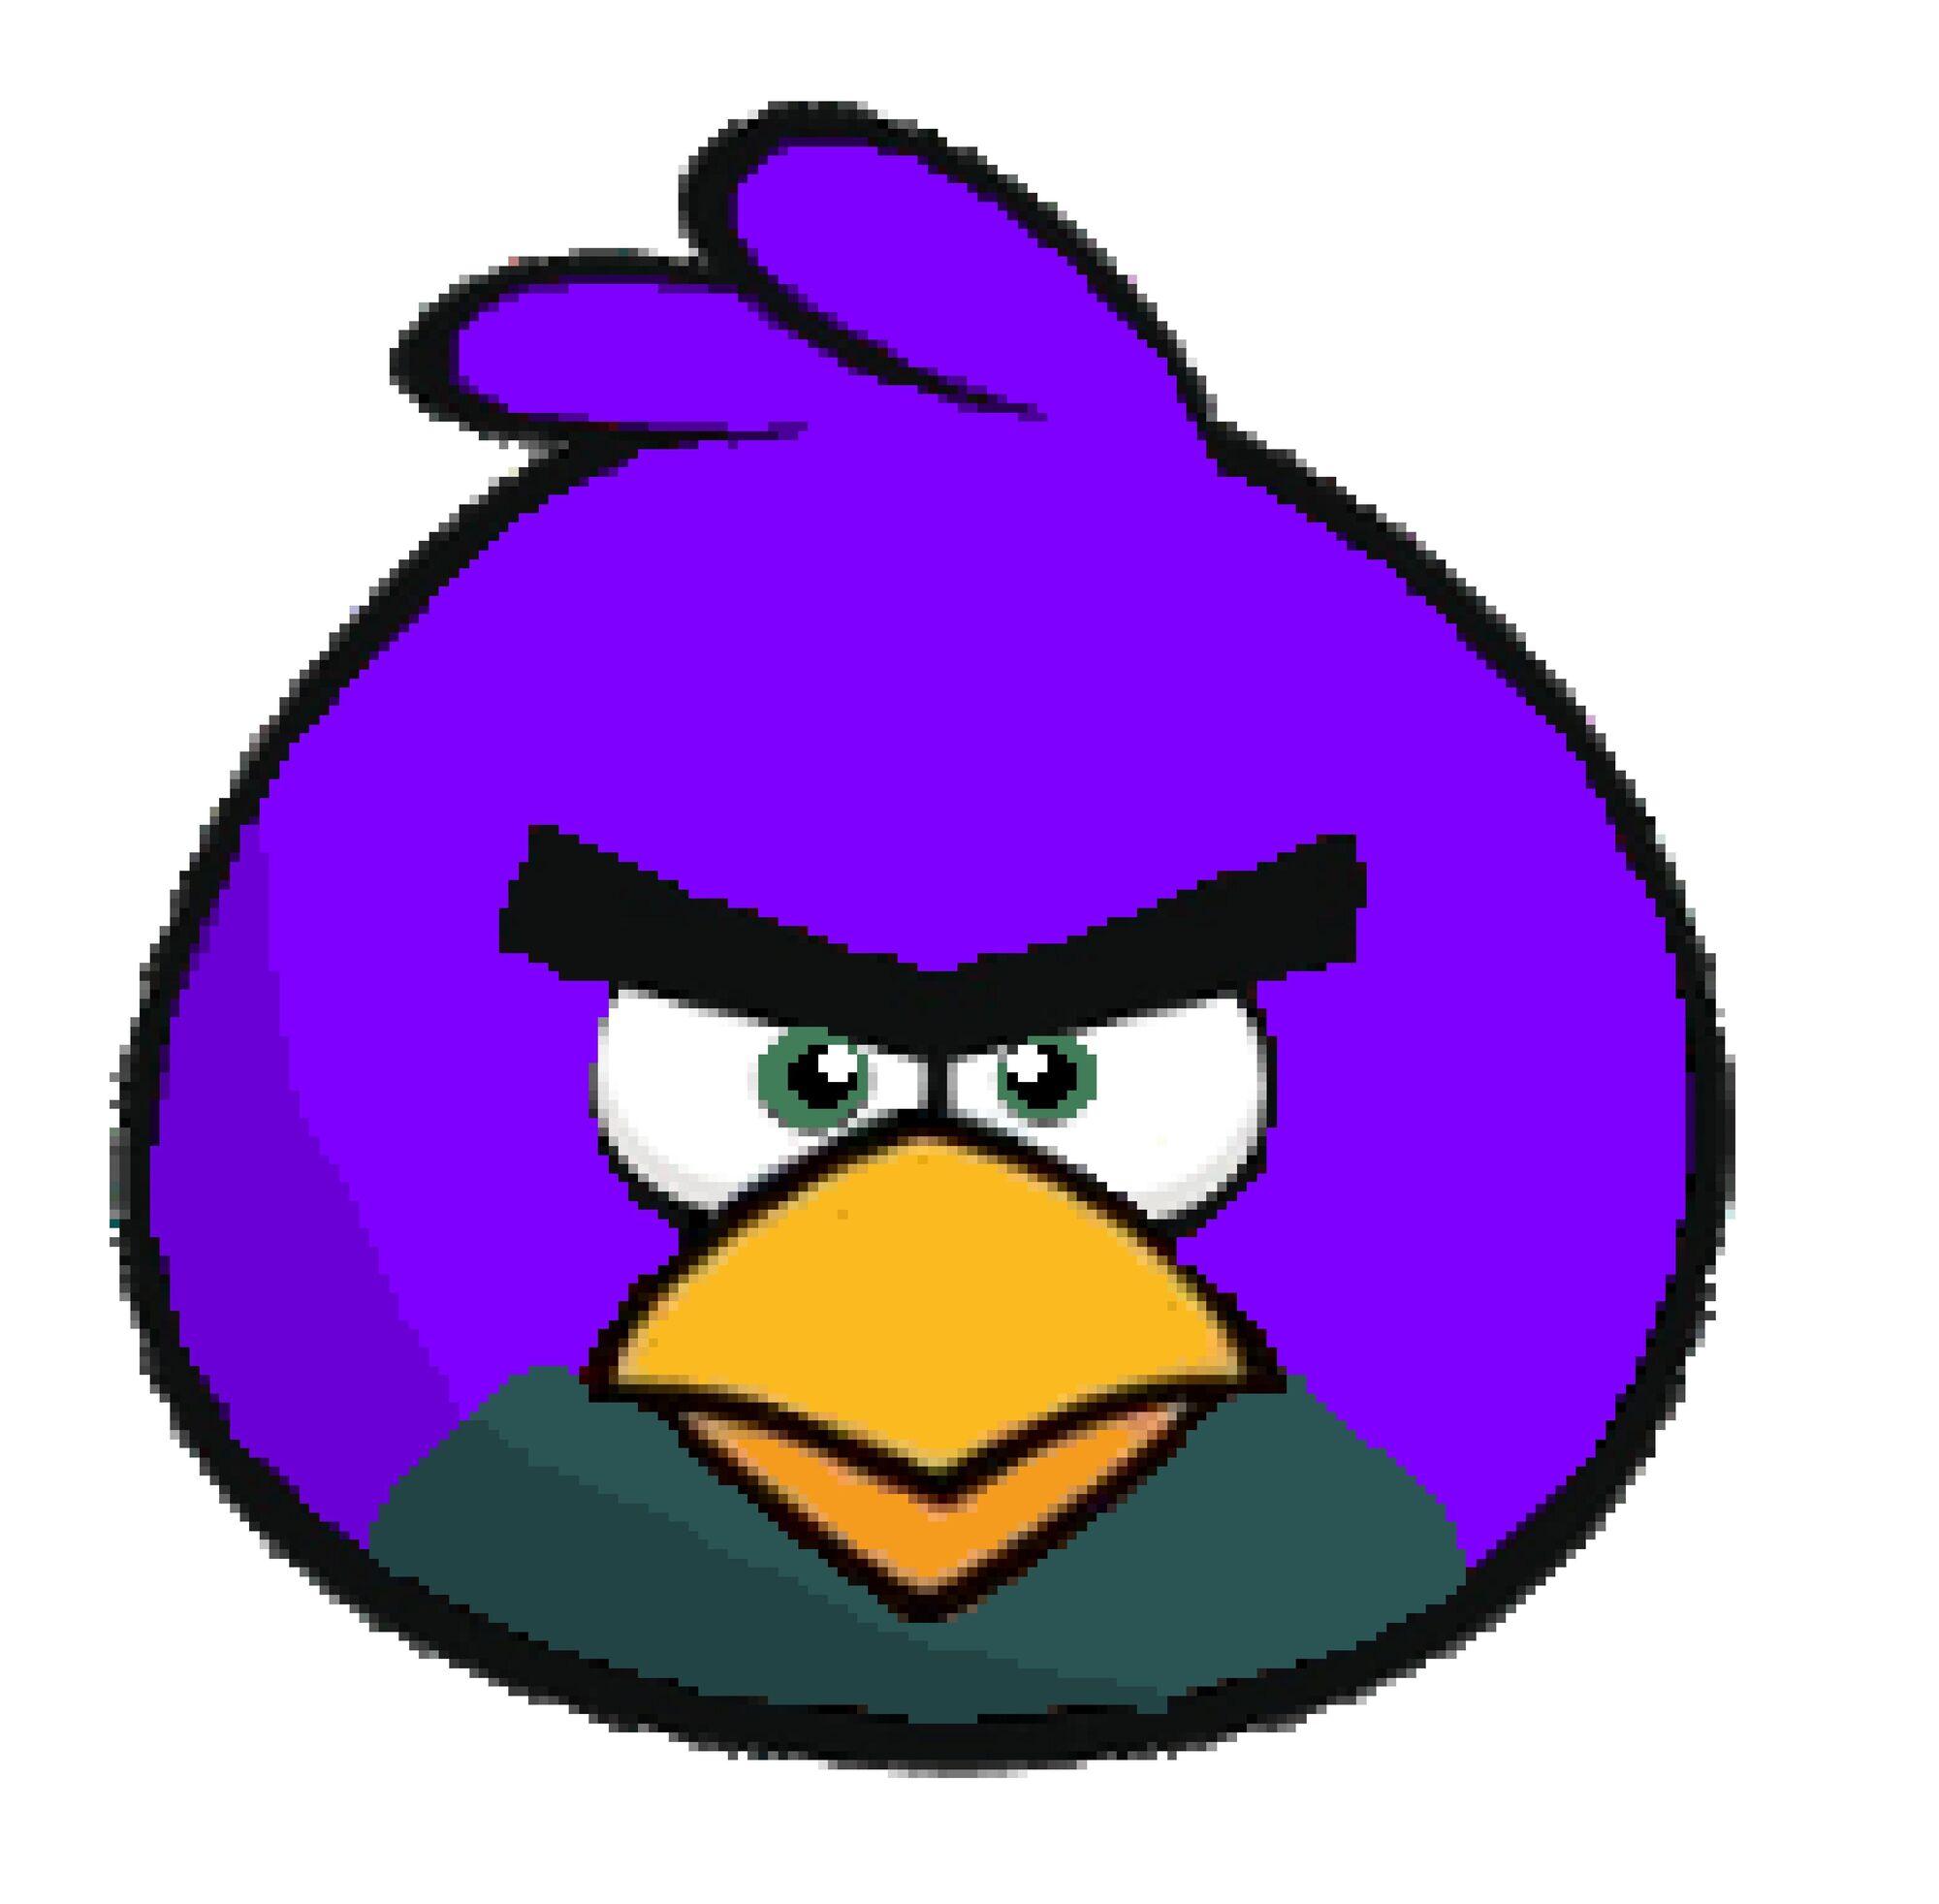 Angry bird purple bird